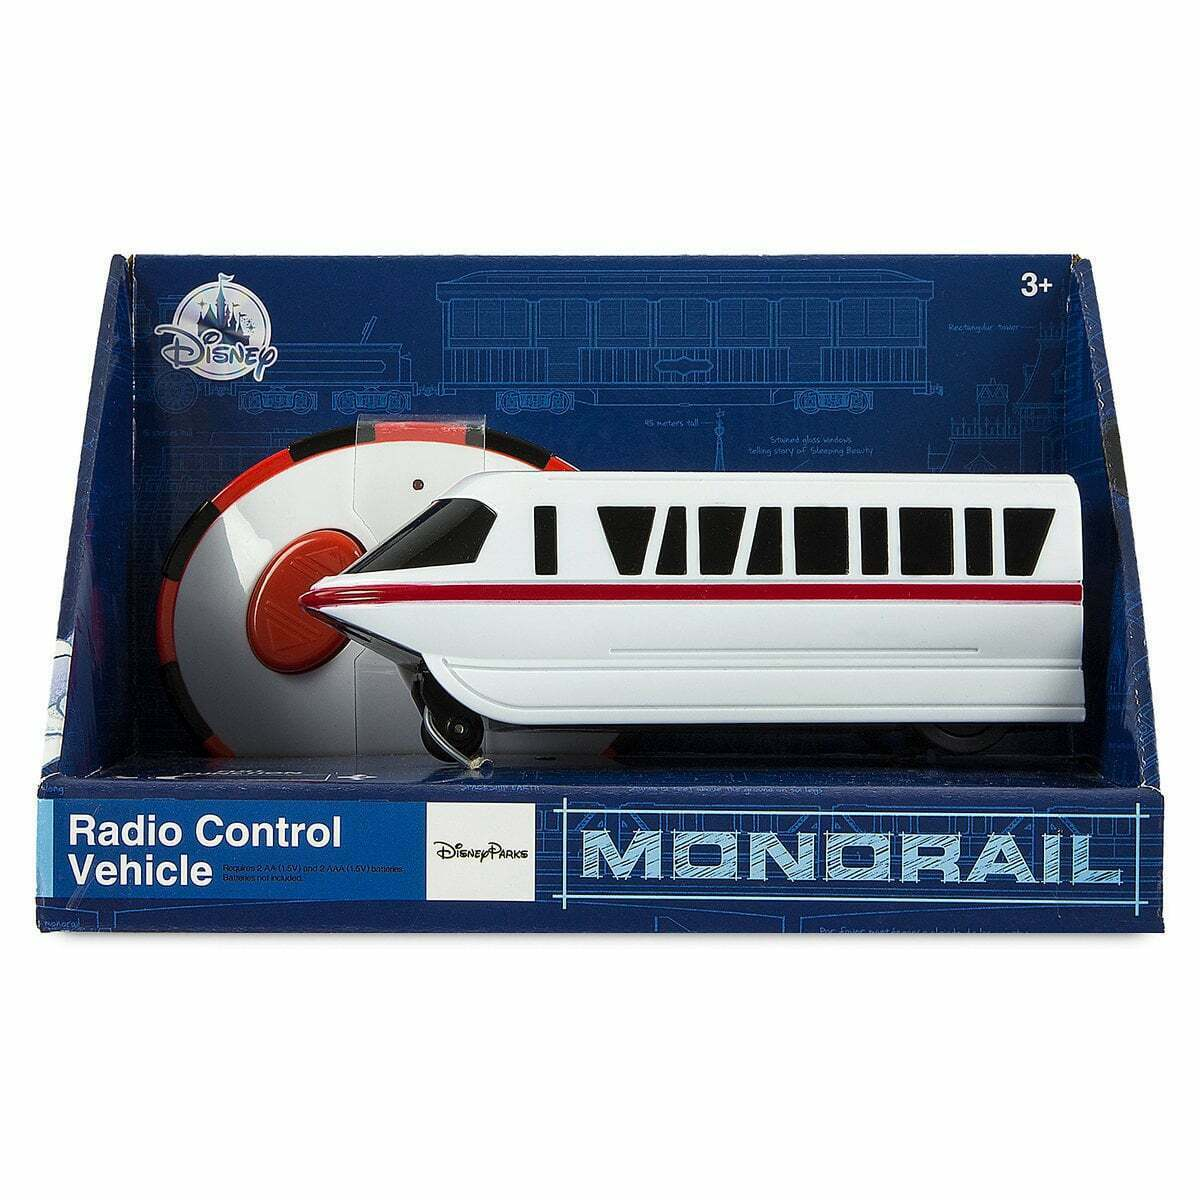 Disney World Monorail Radio Control Toy Vehicle, NEW - $28.00